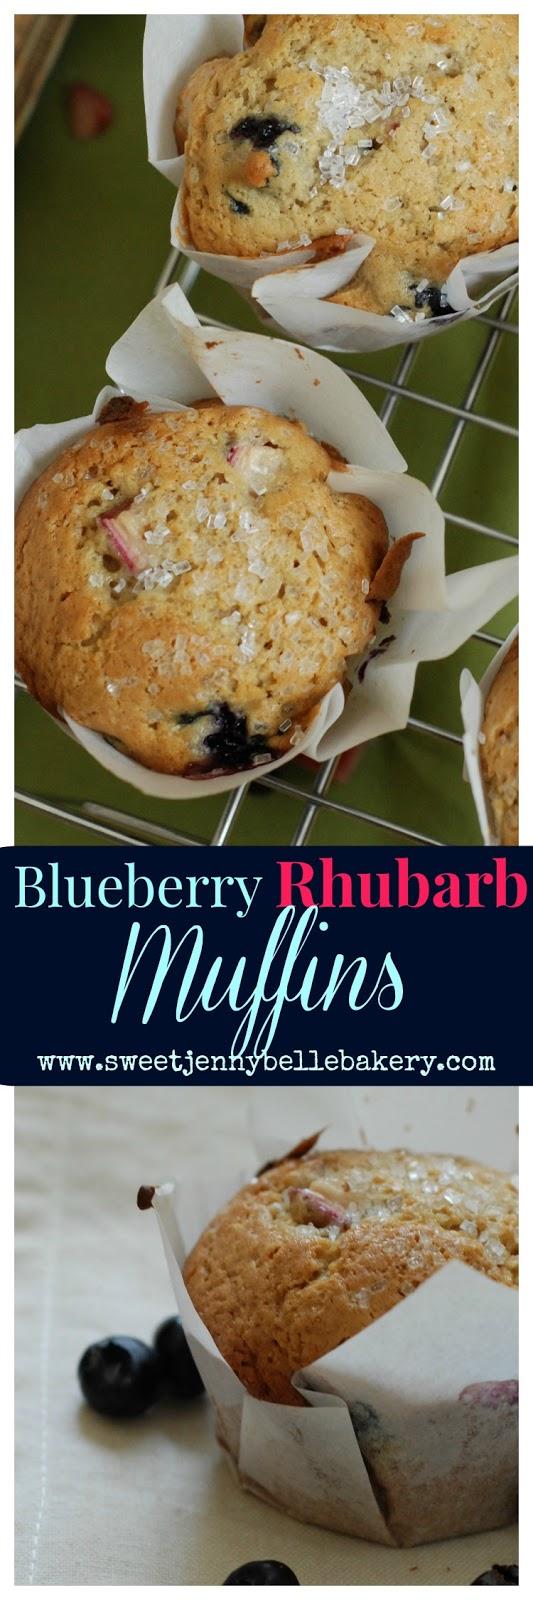 easy blueberry rhubarb muffin recipe